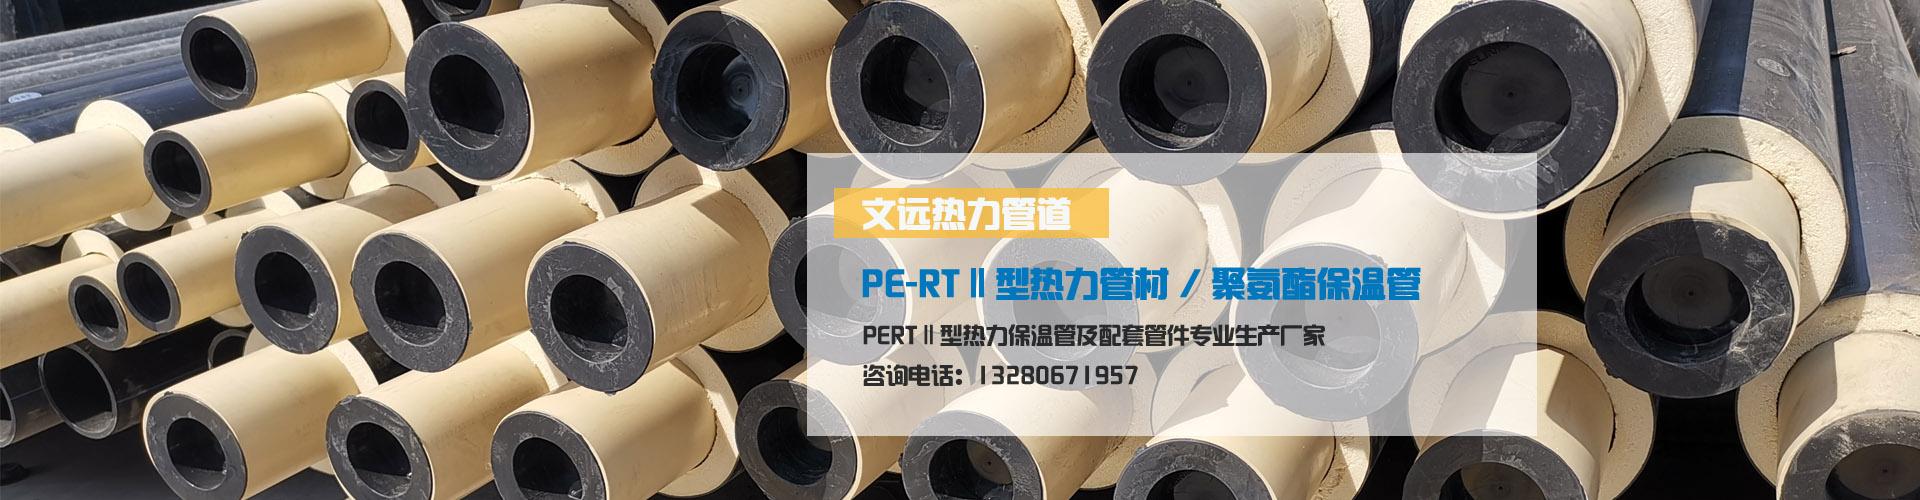 PERT2型管厂家,PE-RT Ⅱ型热力管